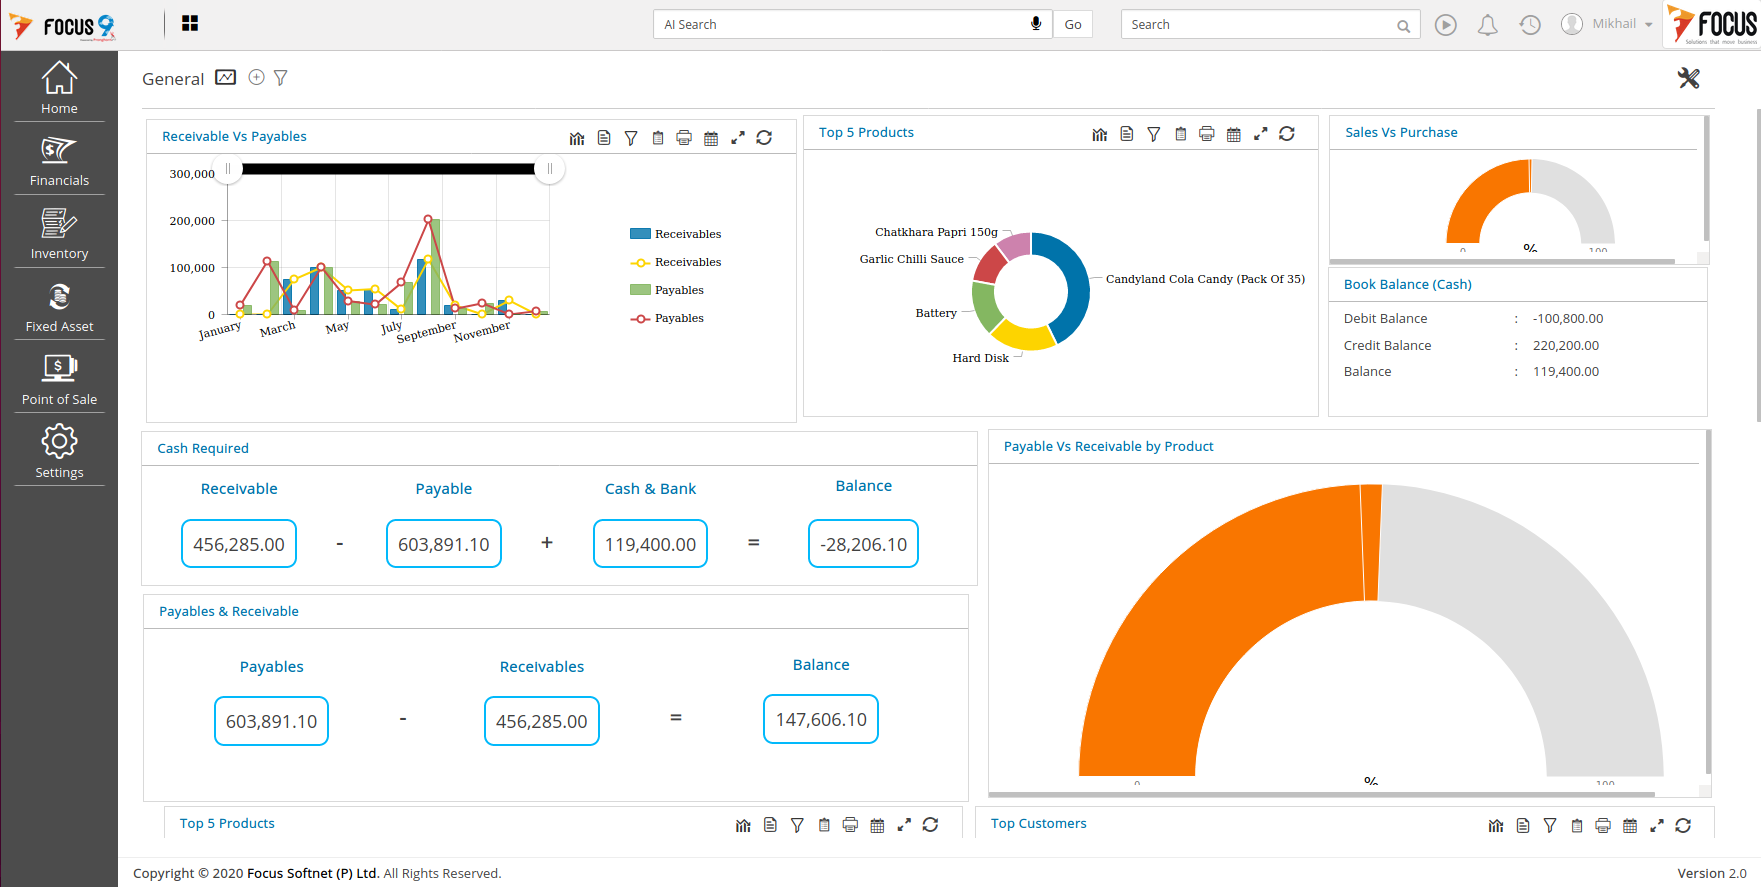 Focus 9 Software - FOCUS9 ERP Dashboard Overview